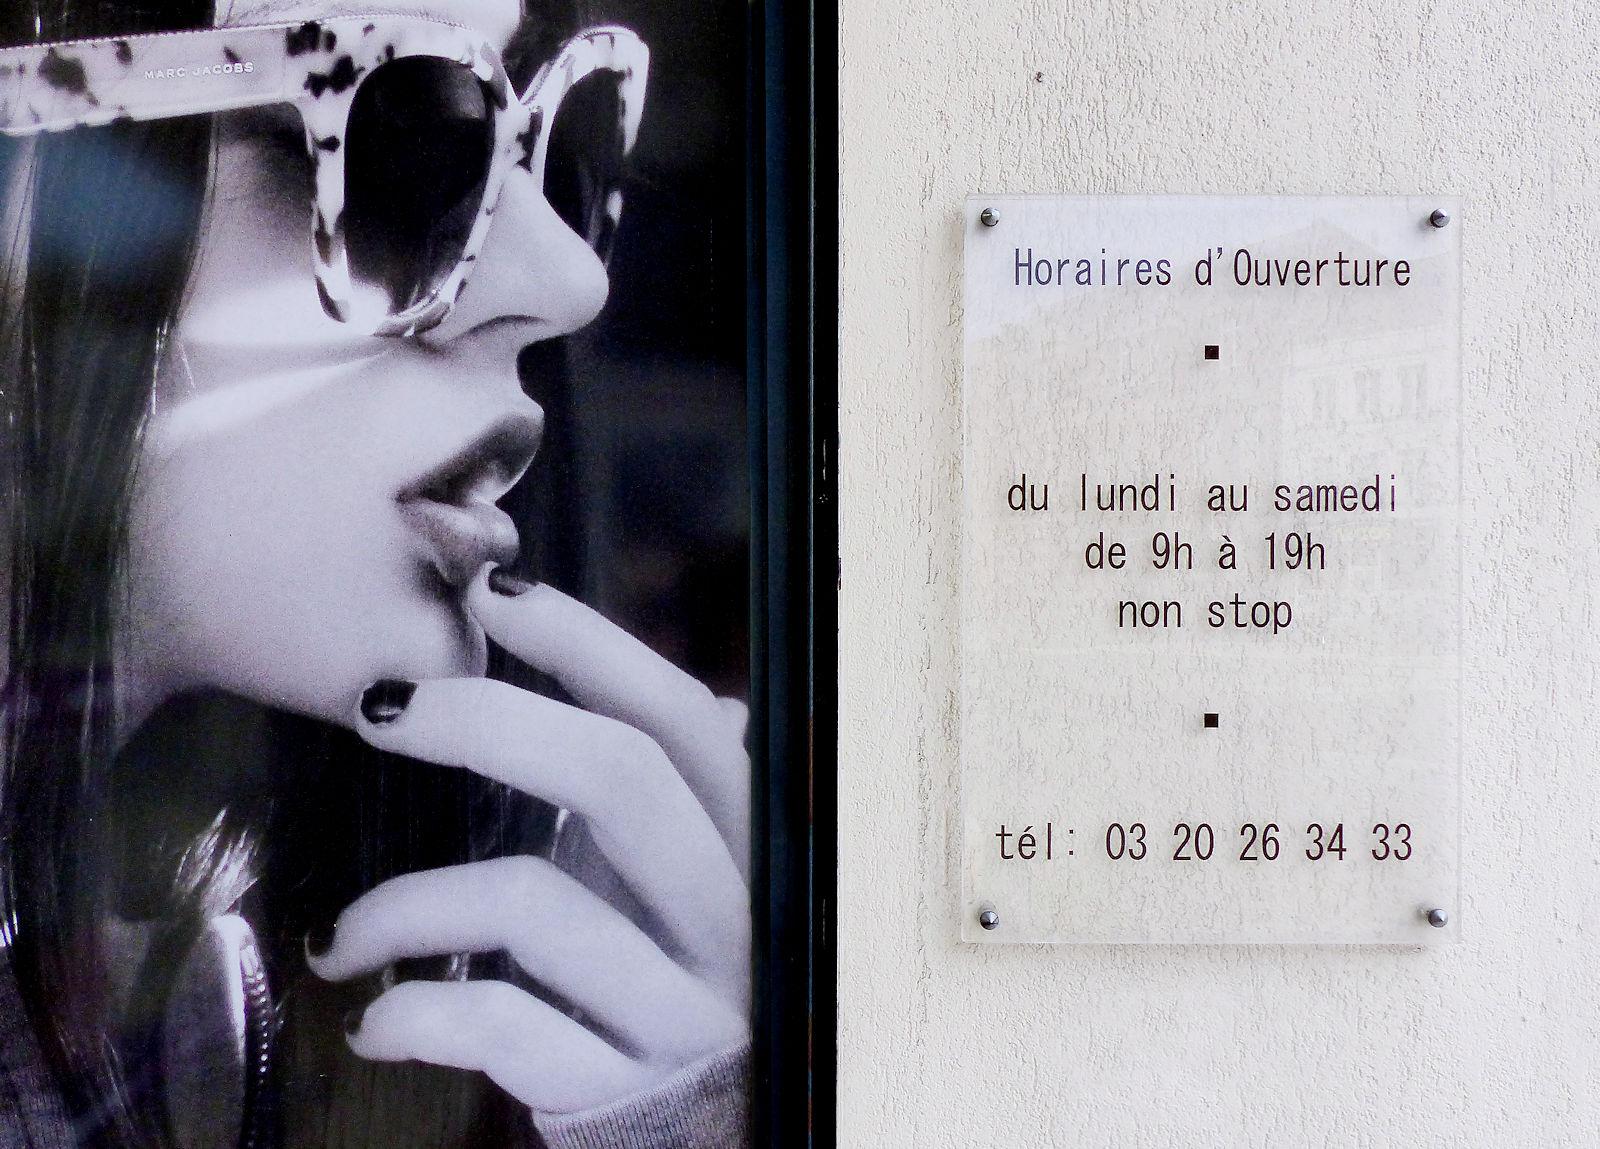 Horaires d'ouverture - Afflelou Tourcoing